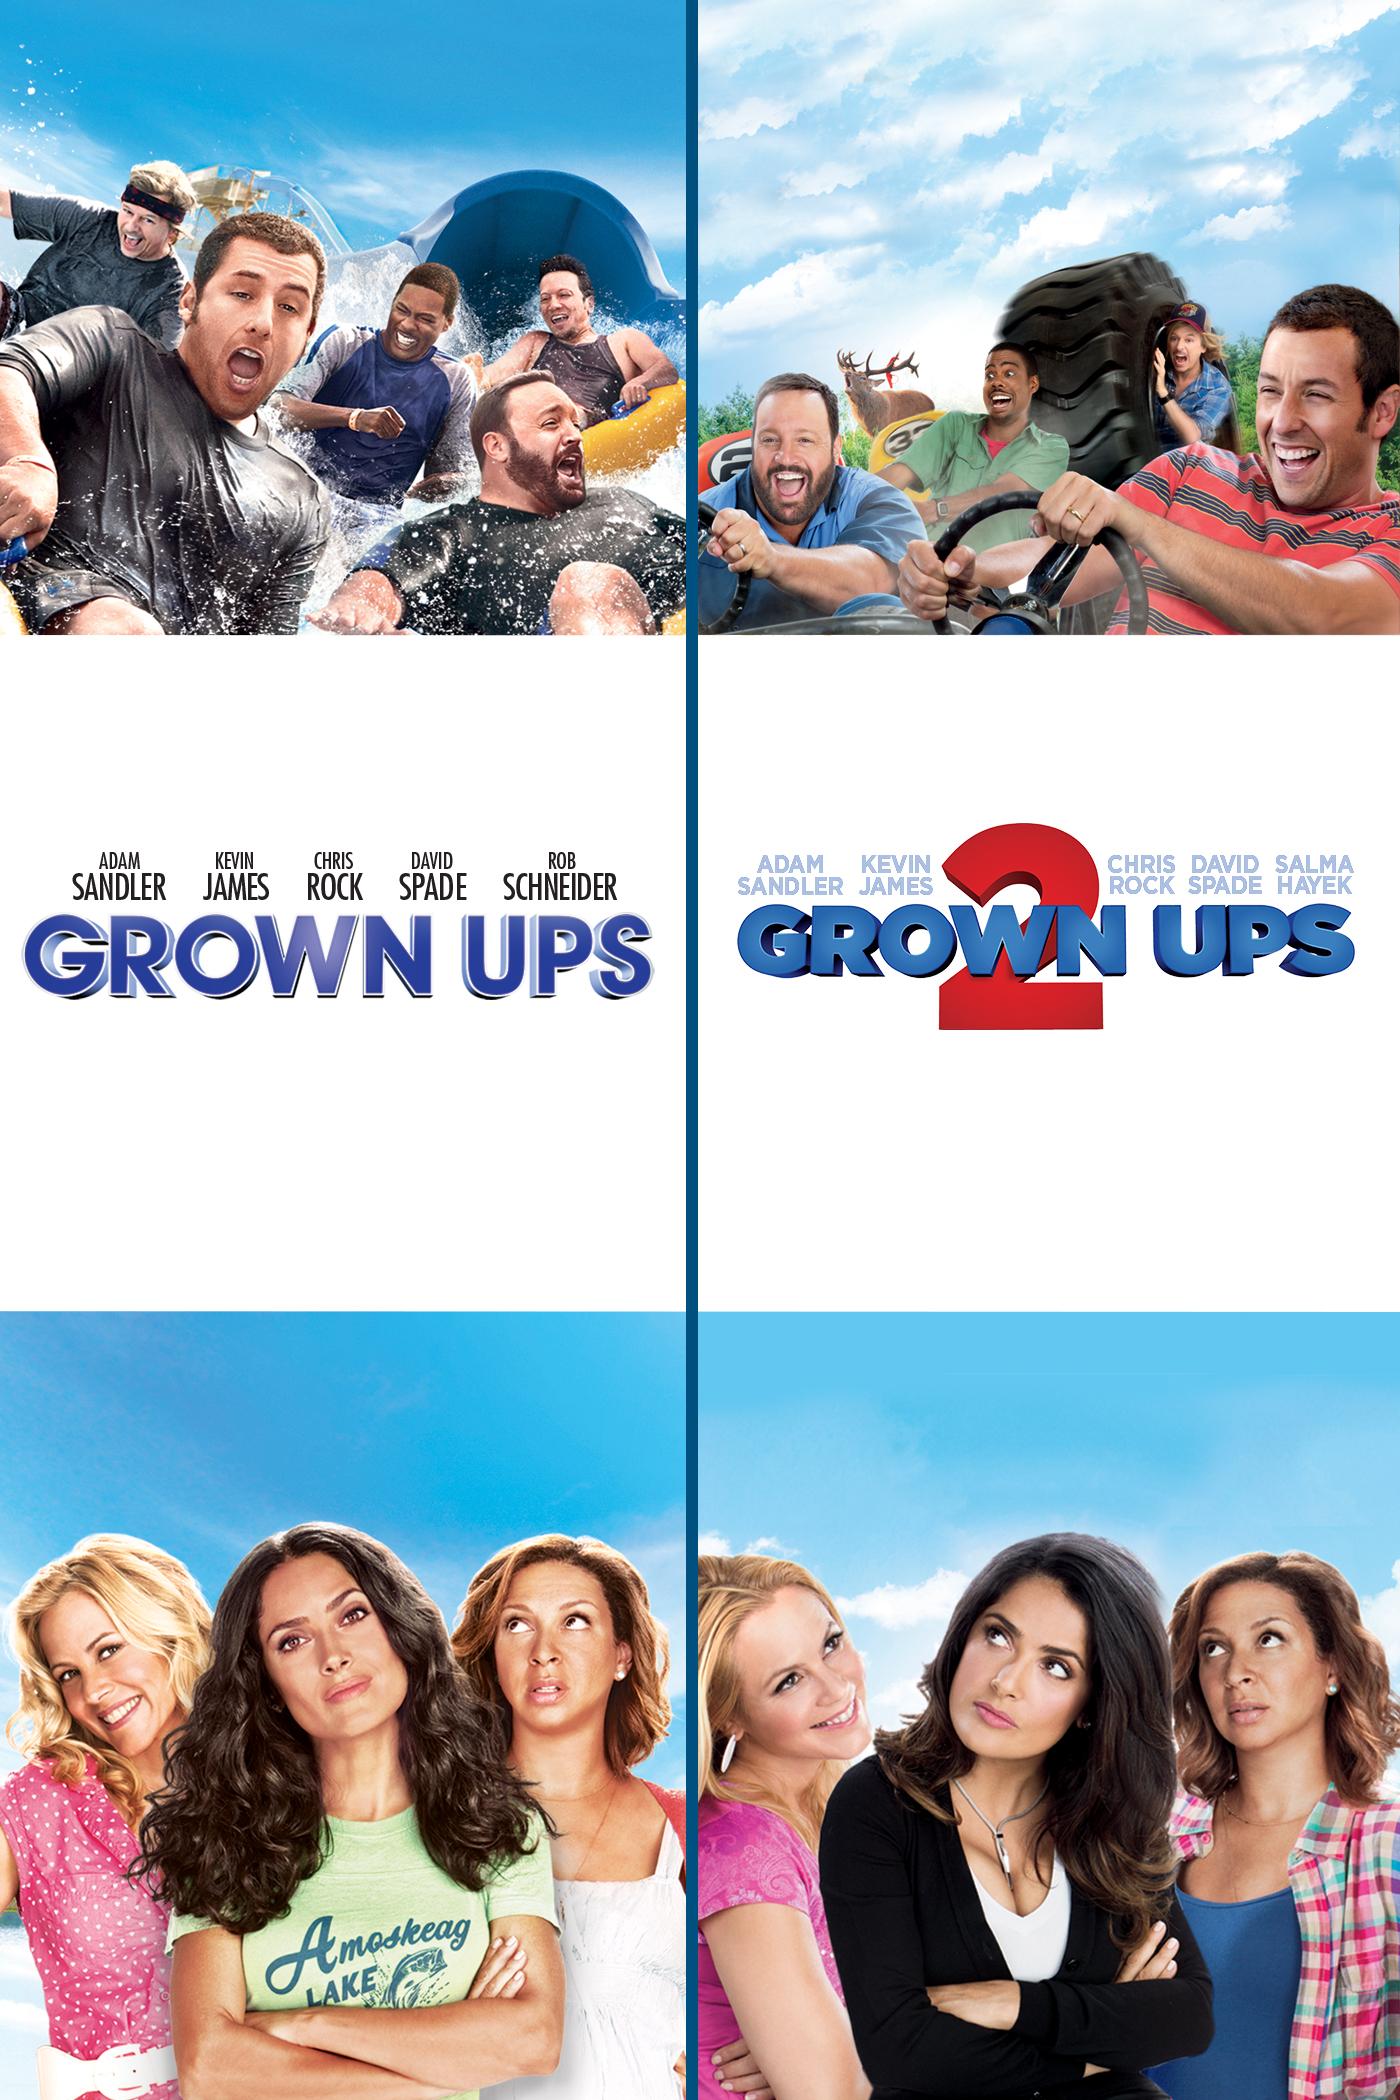 Grown Ups & Grown Ups 2